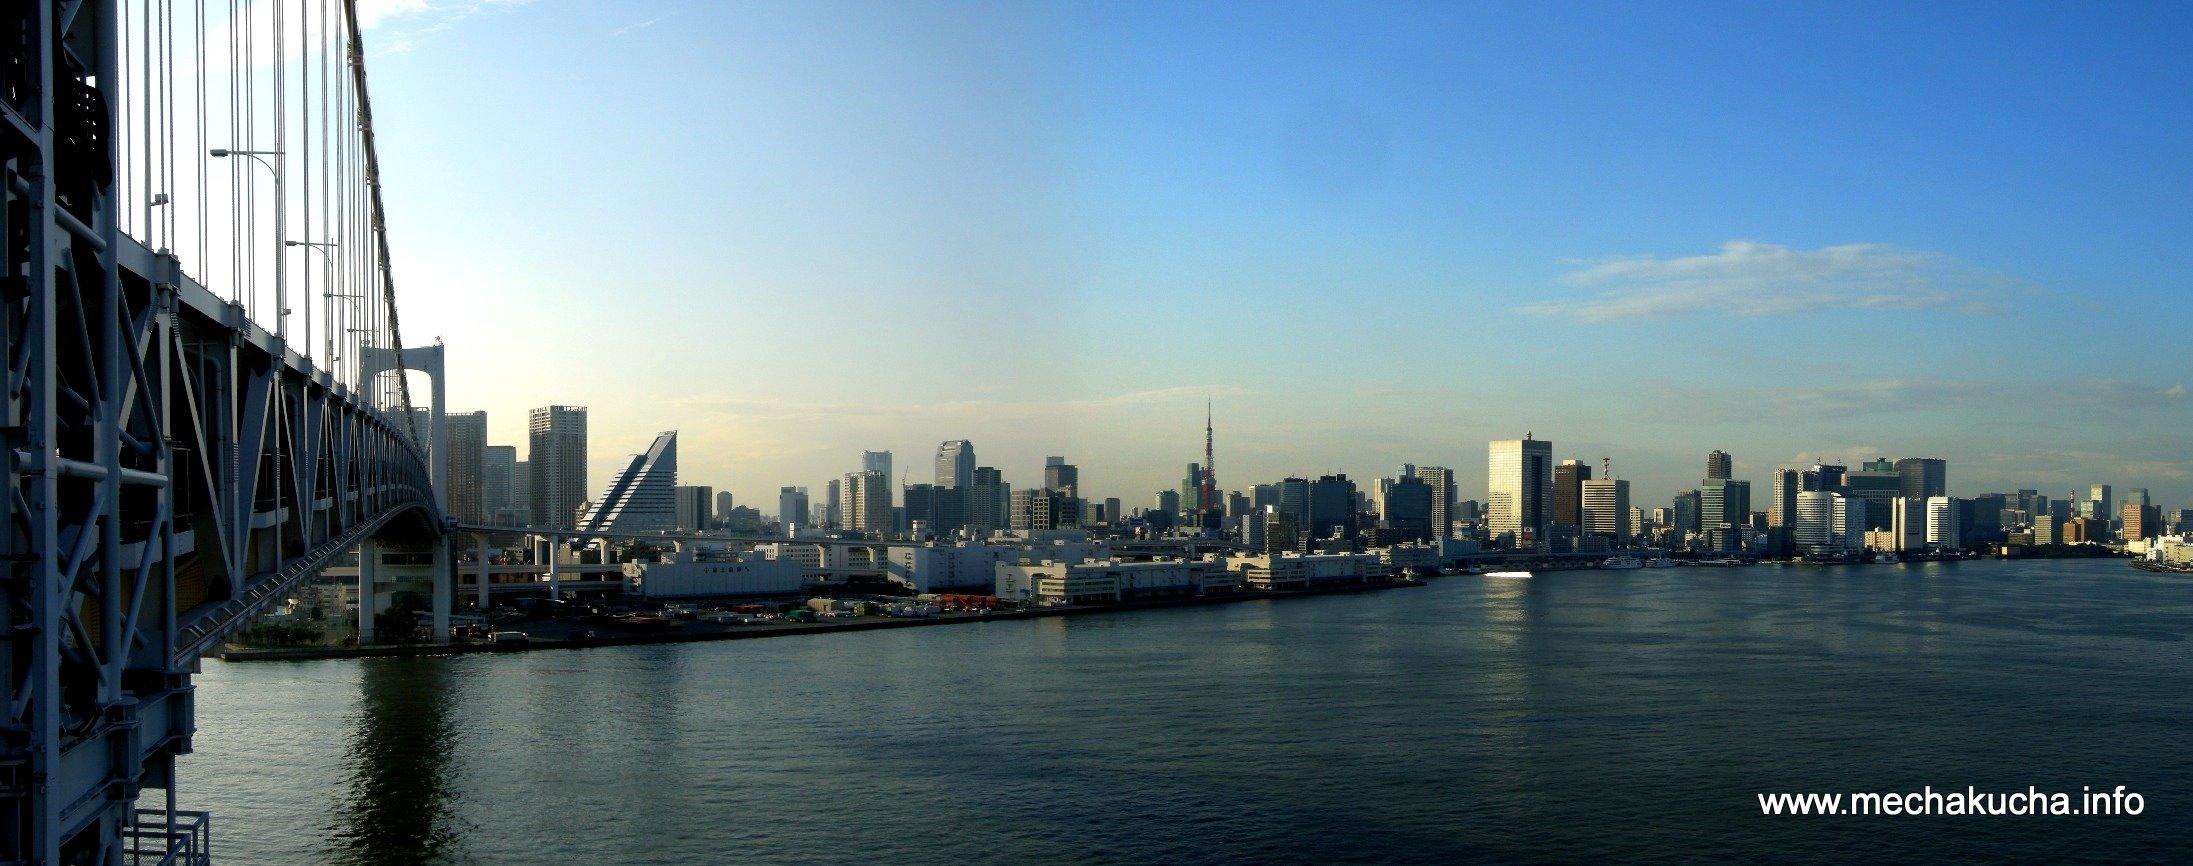 Rainbow Bridge to Tokyo Tower